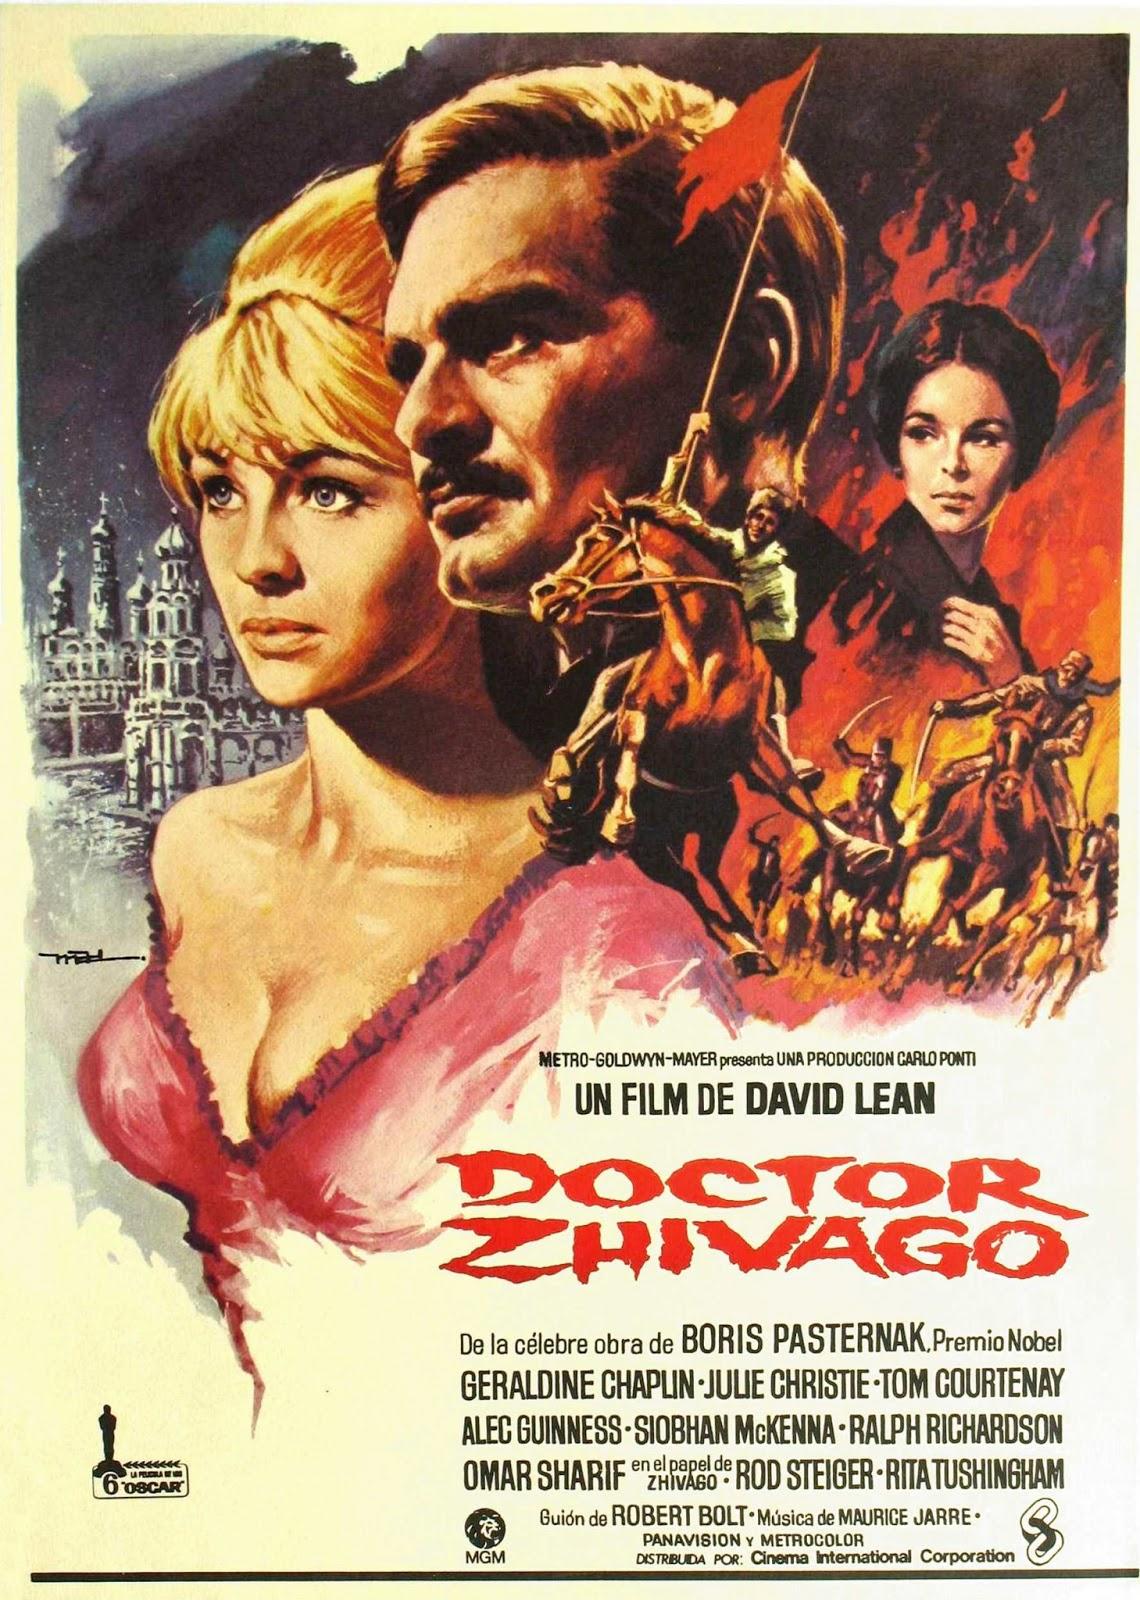 http://2.bp.blogspot.com/-084365Eogbw/UXYxoVlJCLI/AAAAAAAAAO0/fxcM2ORQ0Ec/s1600/Doctor+Zhivago.jpg